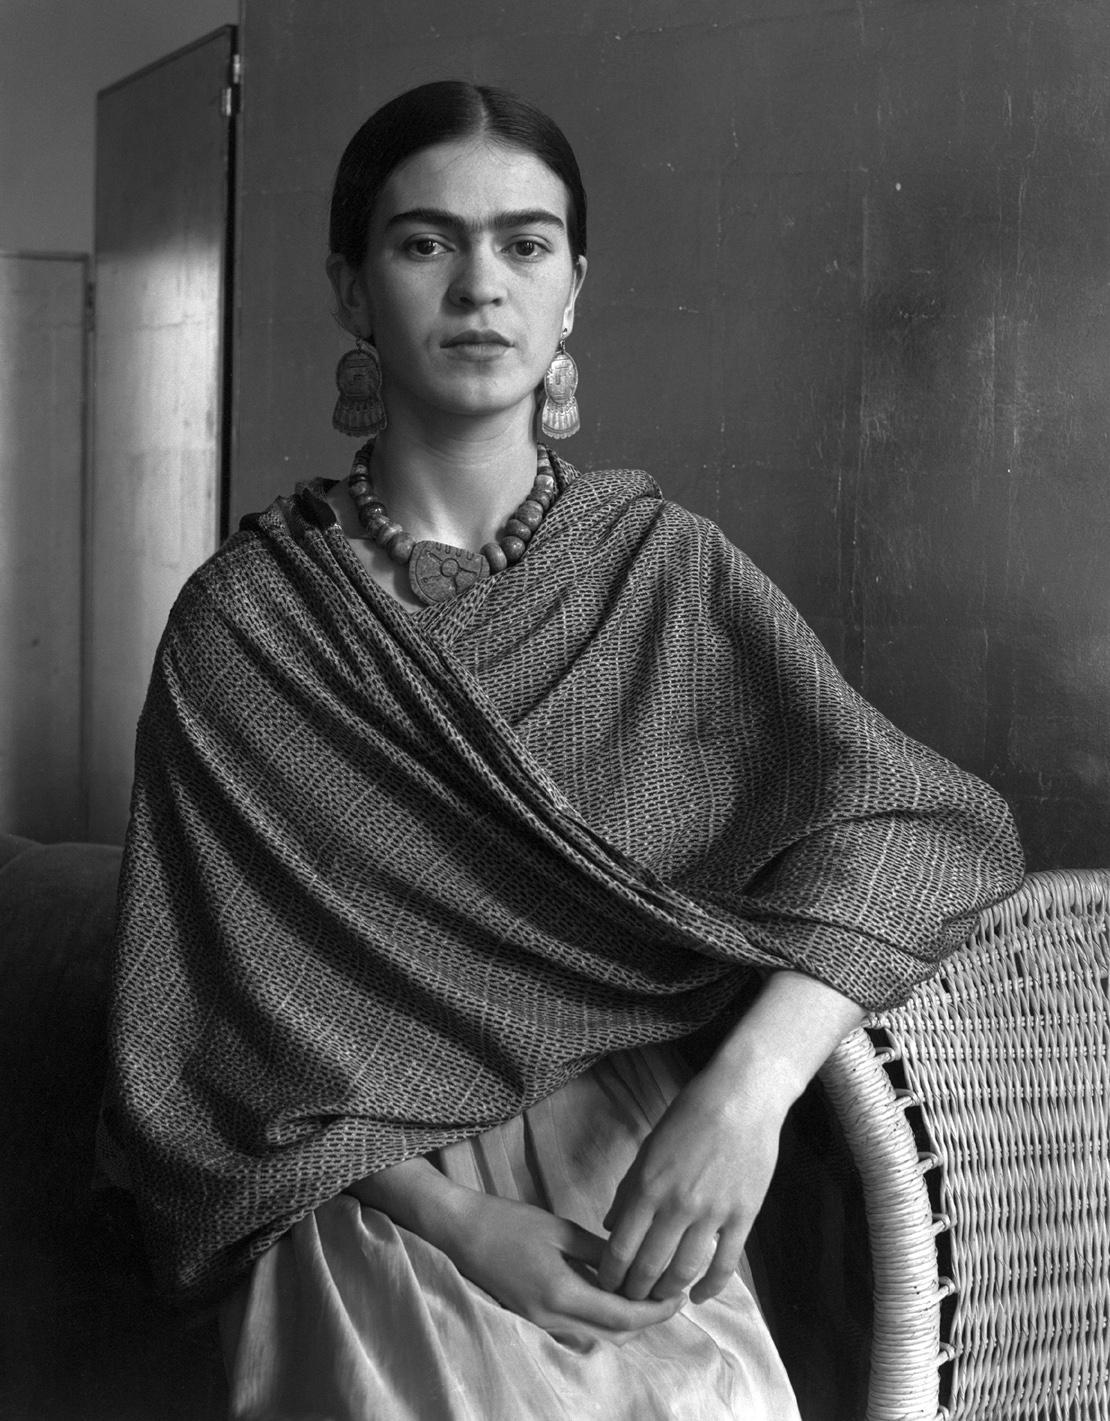 Frida Kahlo by Imogen Cunningham